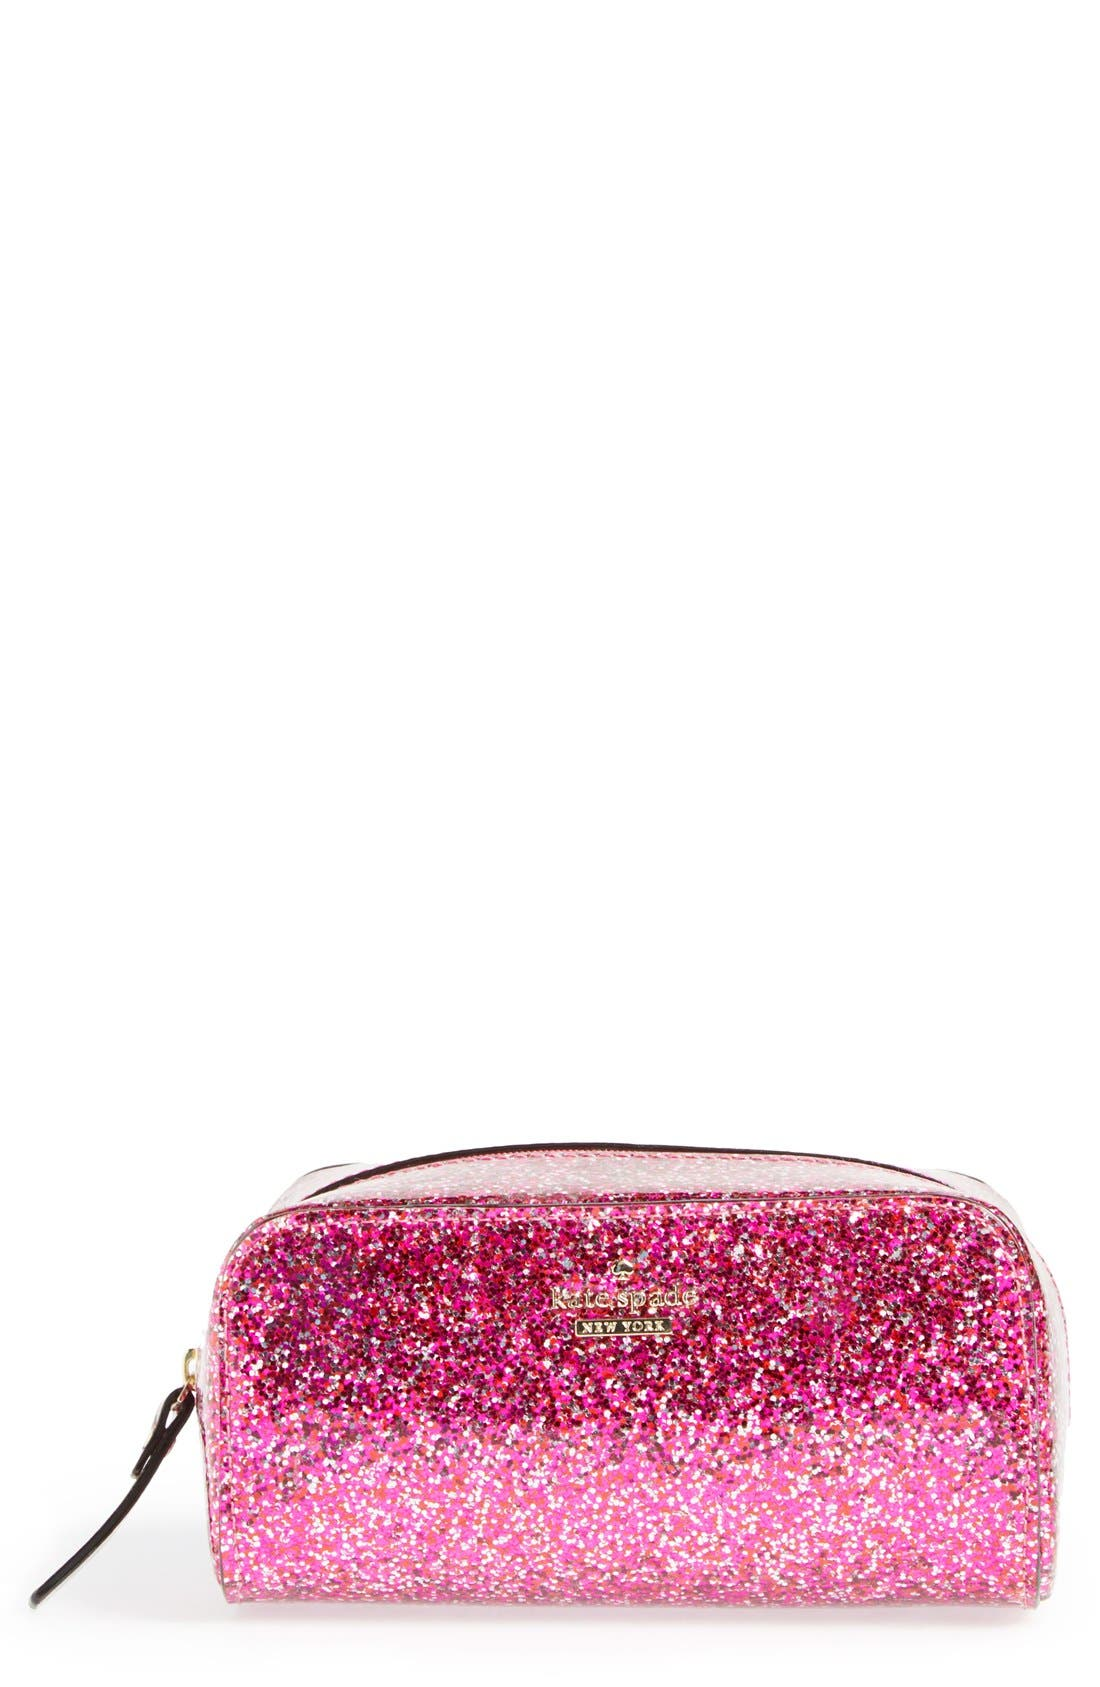 KATE SPADE NEW YORK, 'glitter bug - ezra' cosmetics case, Main thumbnail 1, color, 600